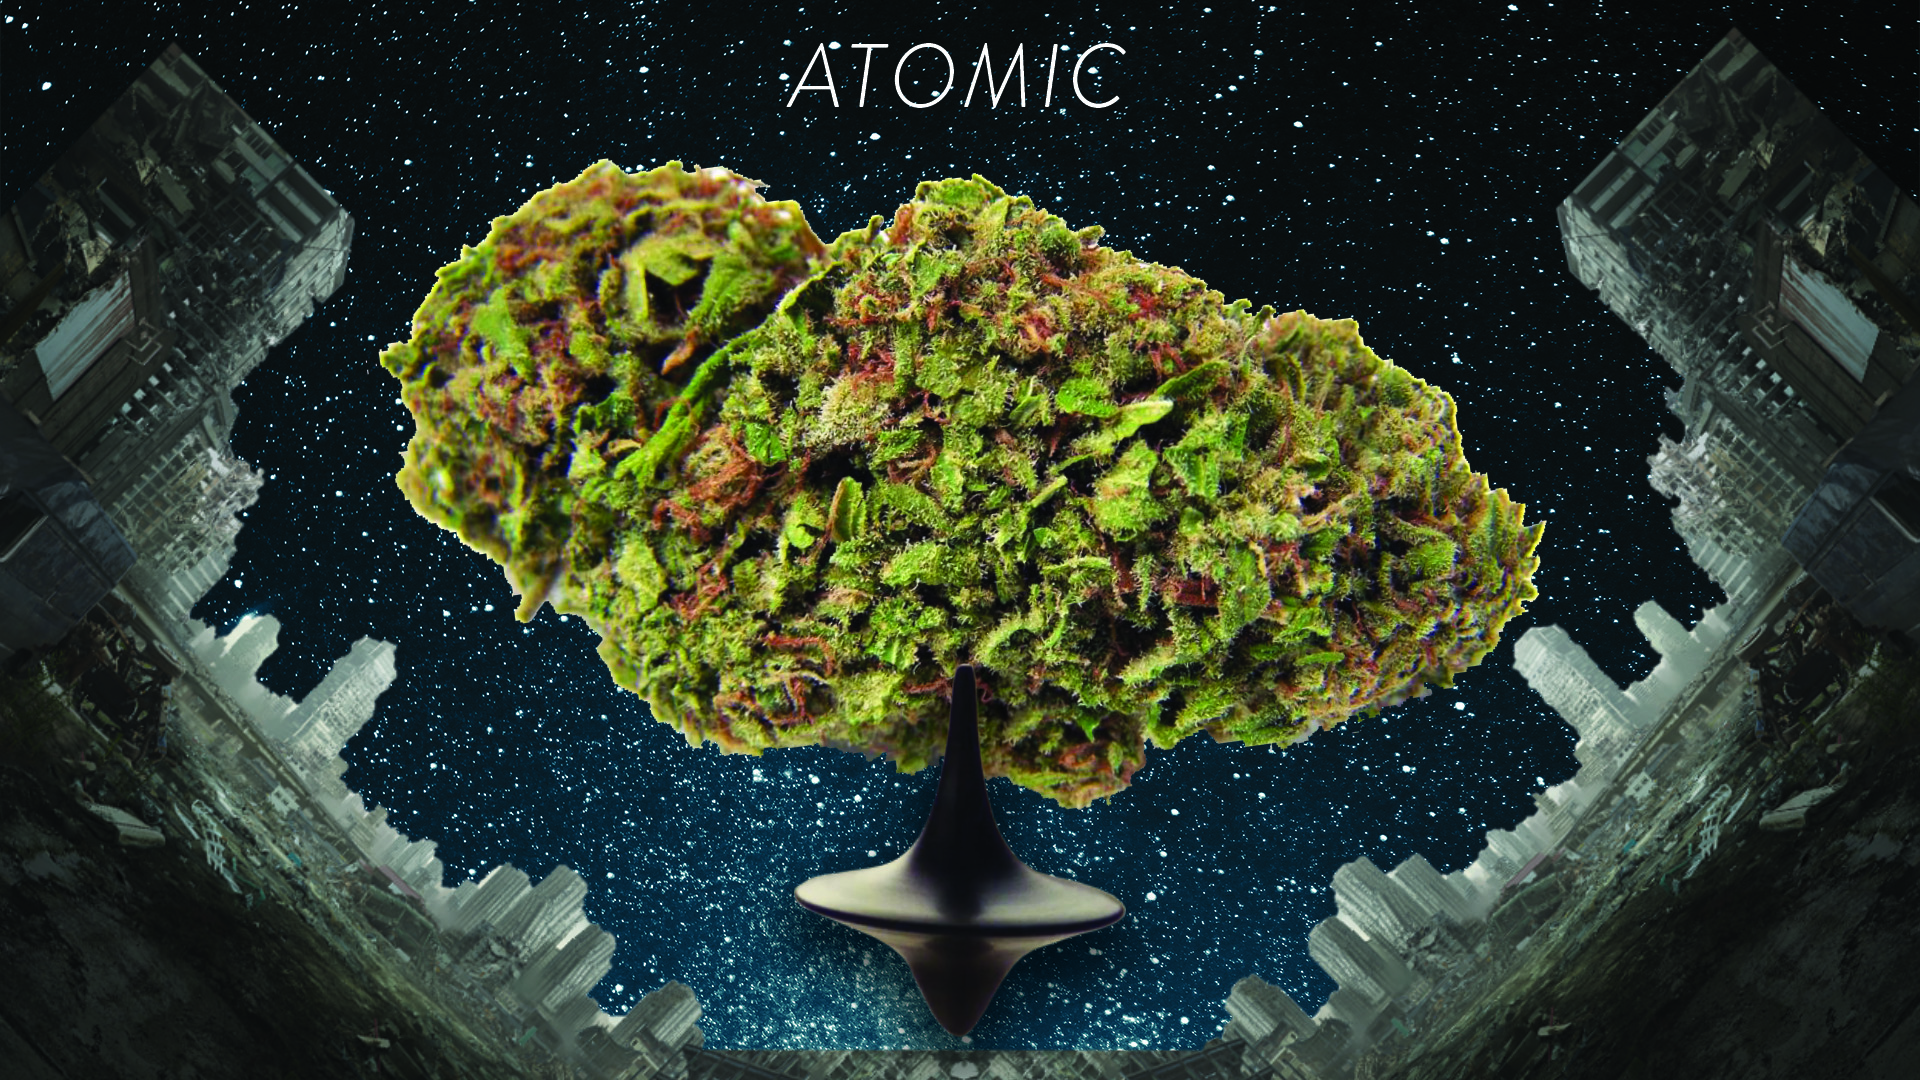 Headlight-Cannabis-Atomic-Far-Out-Films.jpg